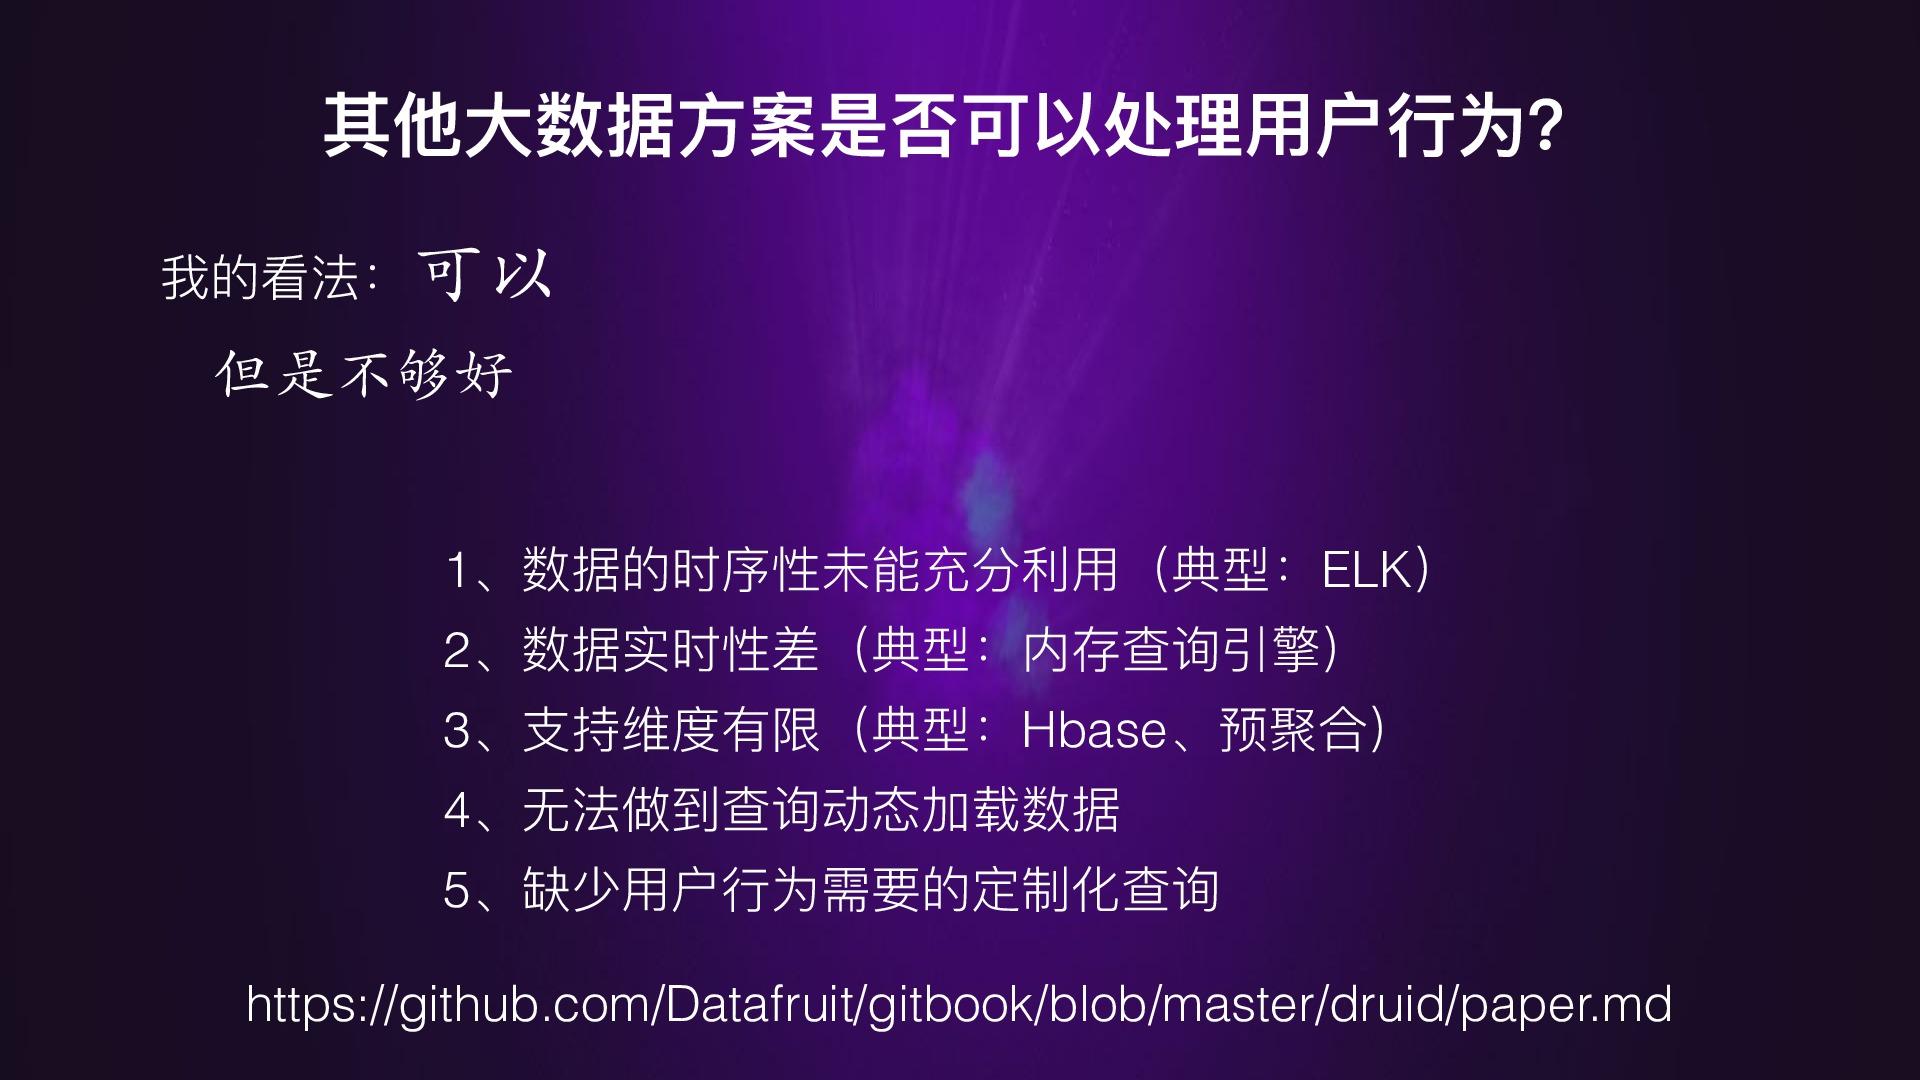 https://opentalk-blog.b0.upaiyun.com/prod/2017-10-31/1768eb4fa07bc376e5855d68a310b181